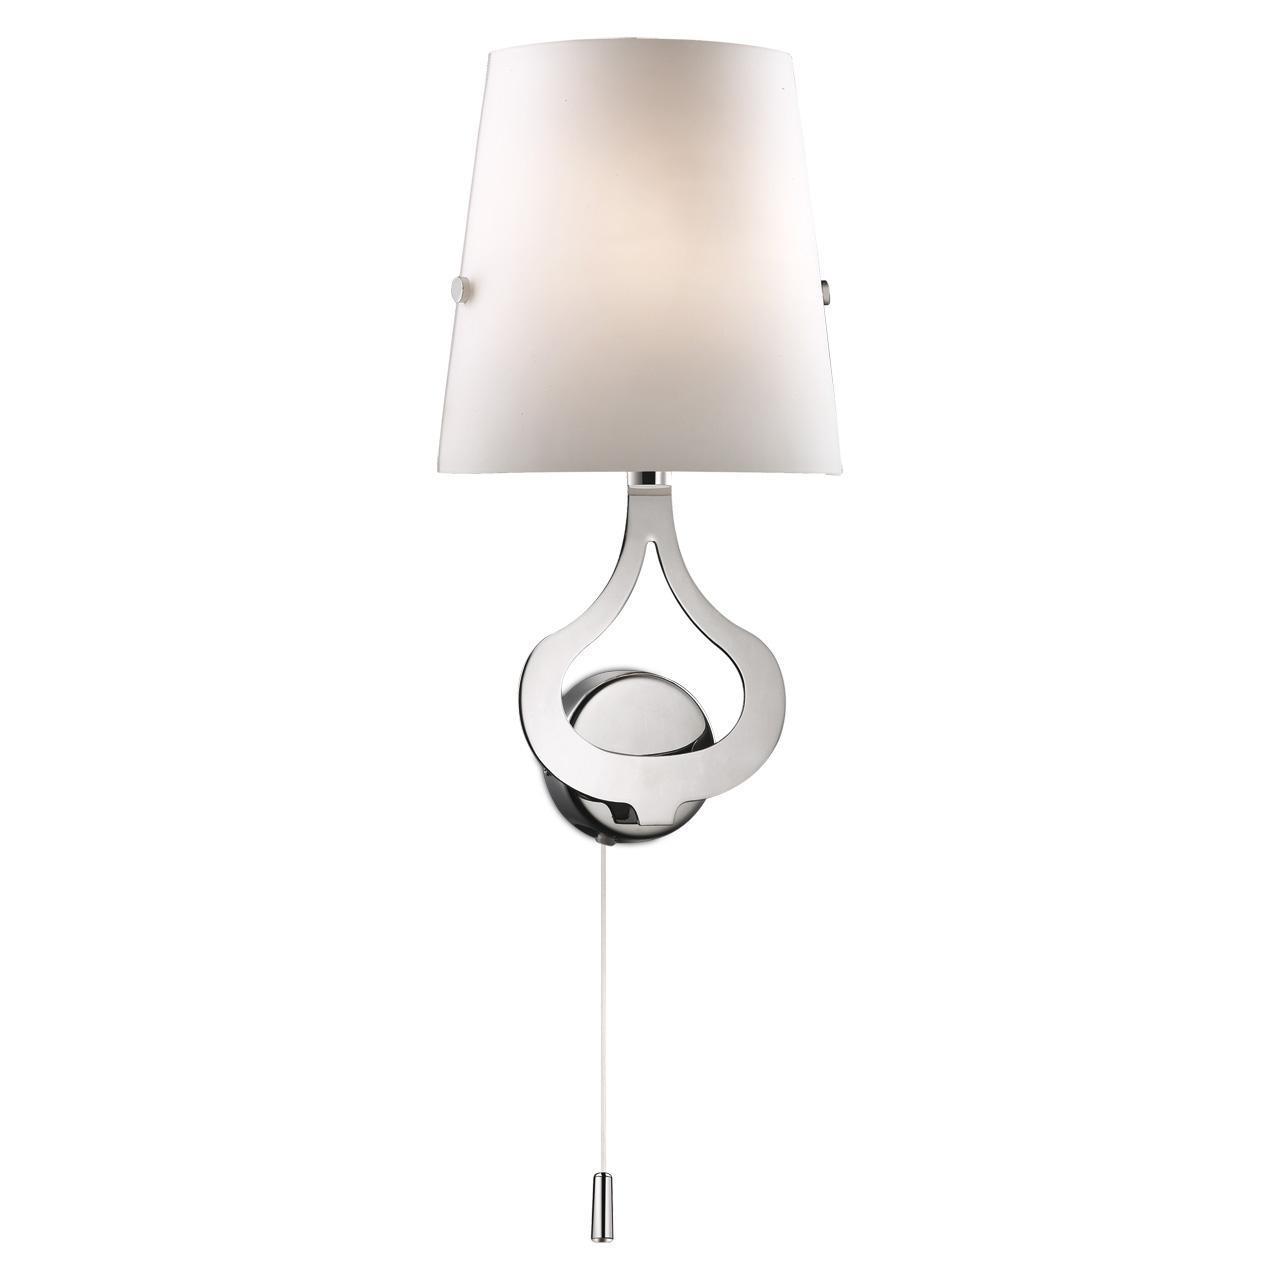 лучшая цена Бра Odeon Light Tiara 2184/1W